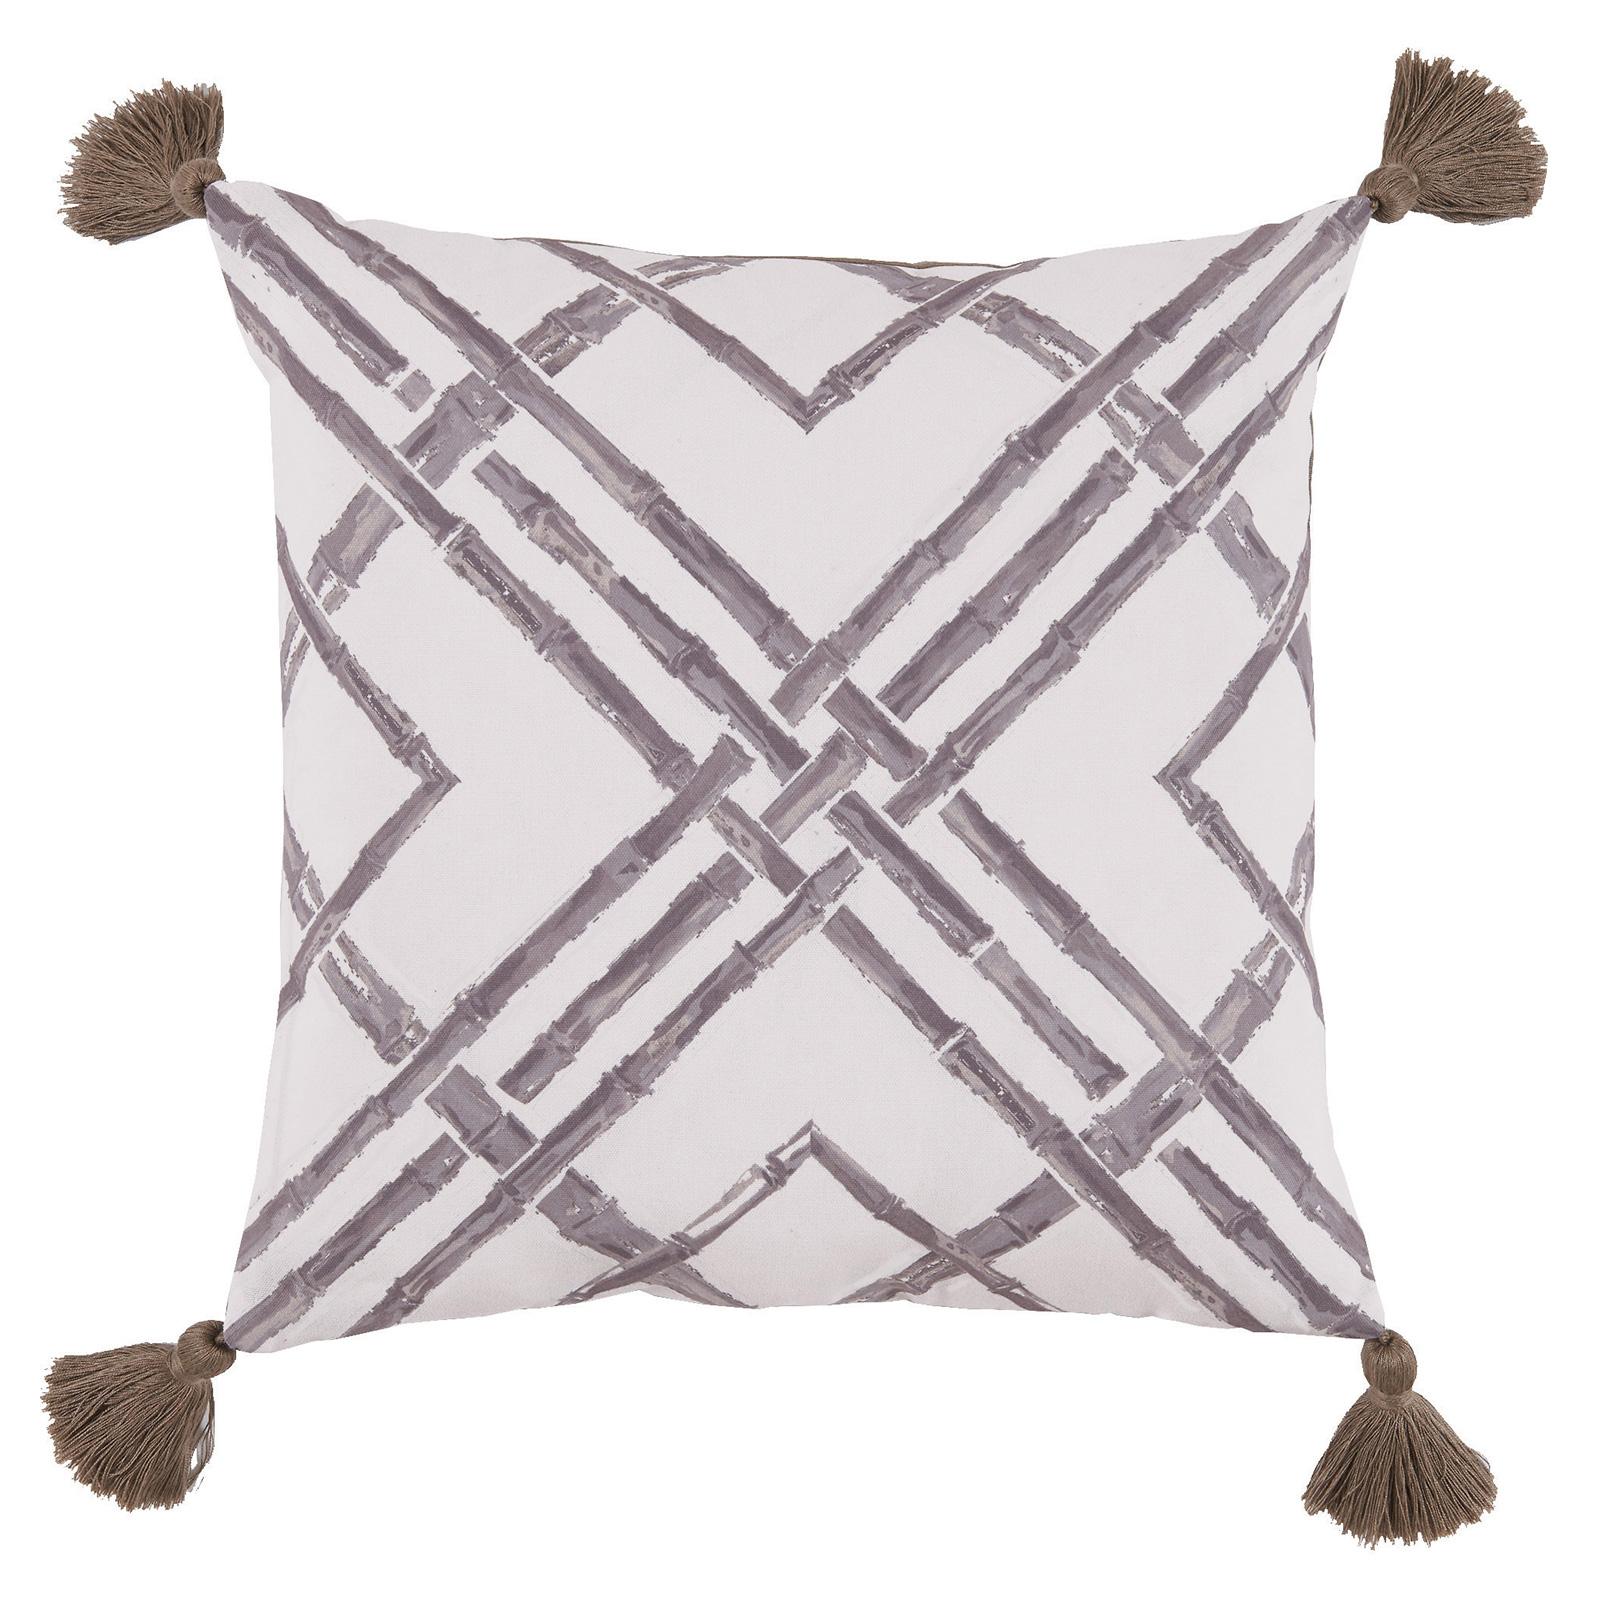 Mumbi Bazaar Taupe Bamboo Tassel Outdoor Pillow - 20x20